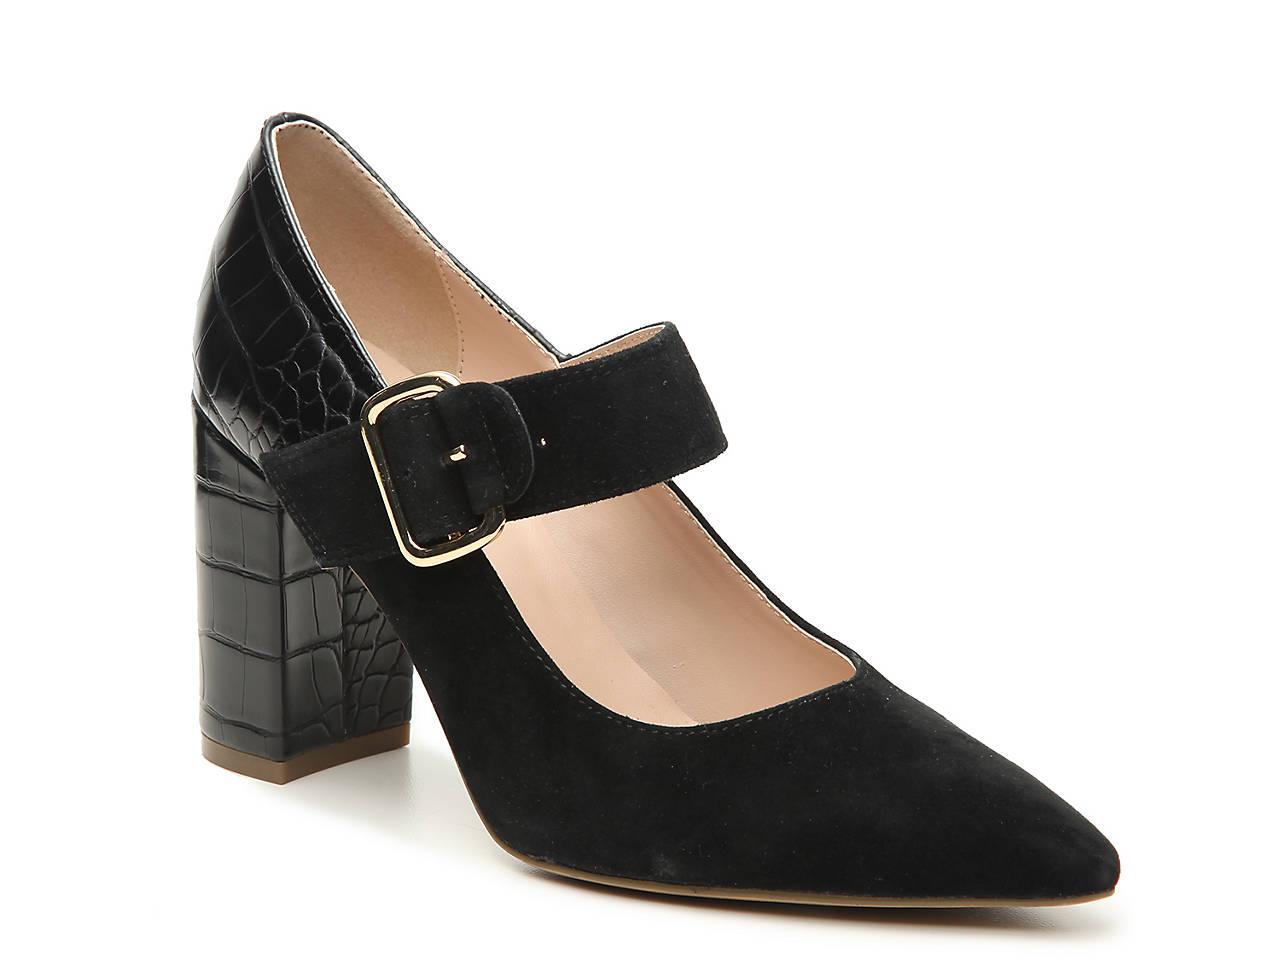 0cf88dee1b872 Tommy Hilfiger Venture Pump Women s Shoes